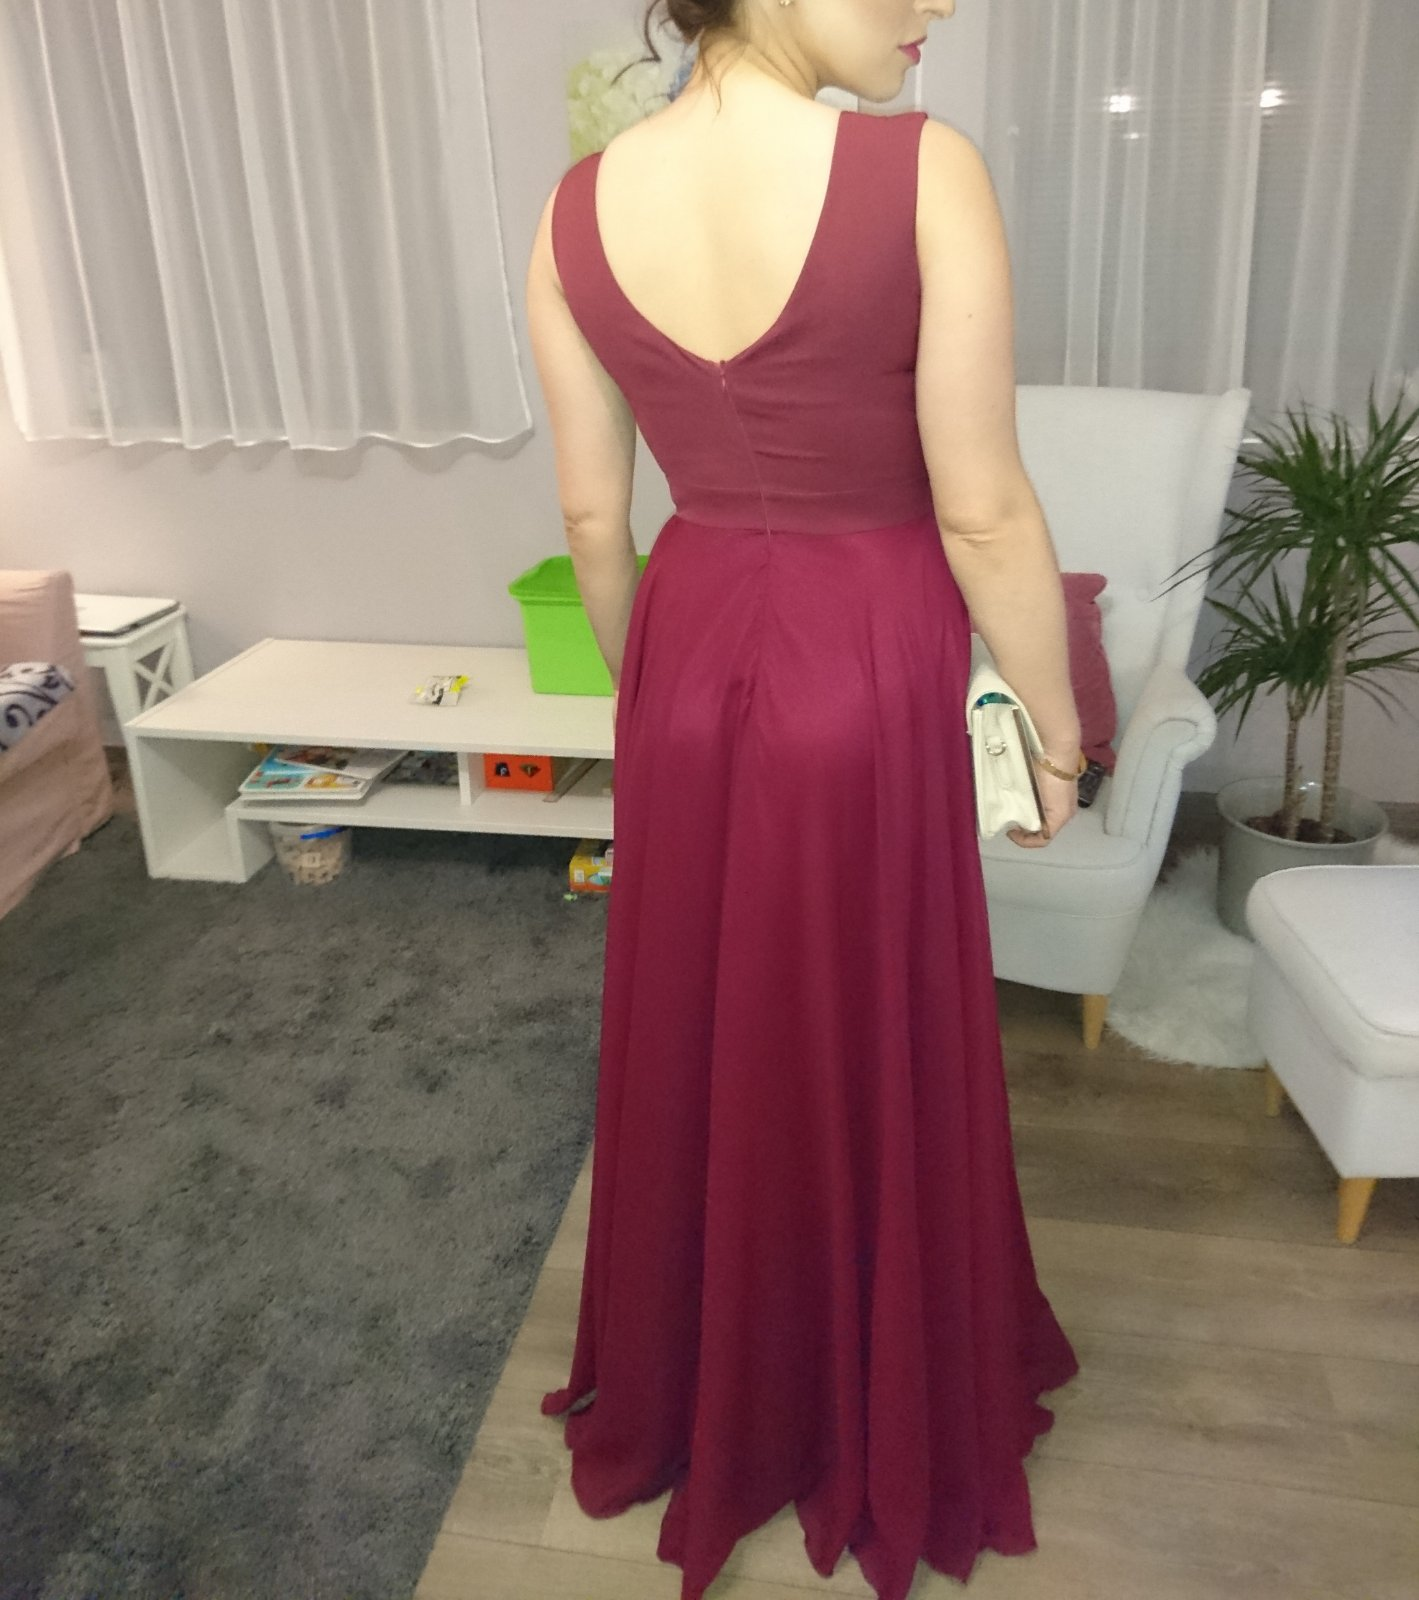 8f37c4a0a240 Vínové spoločenské šaty s-m